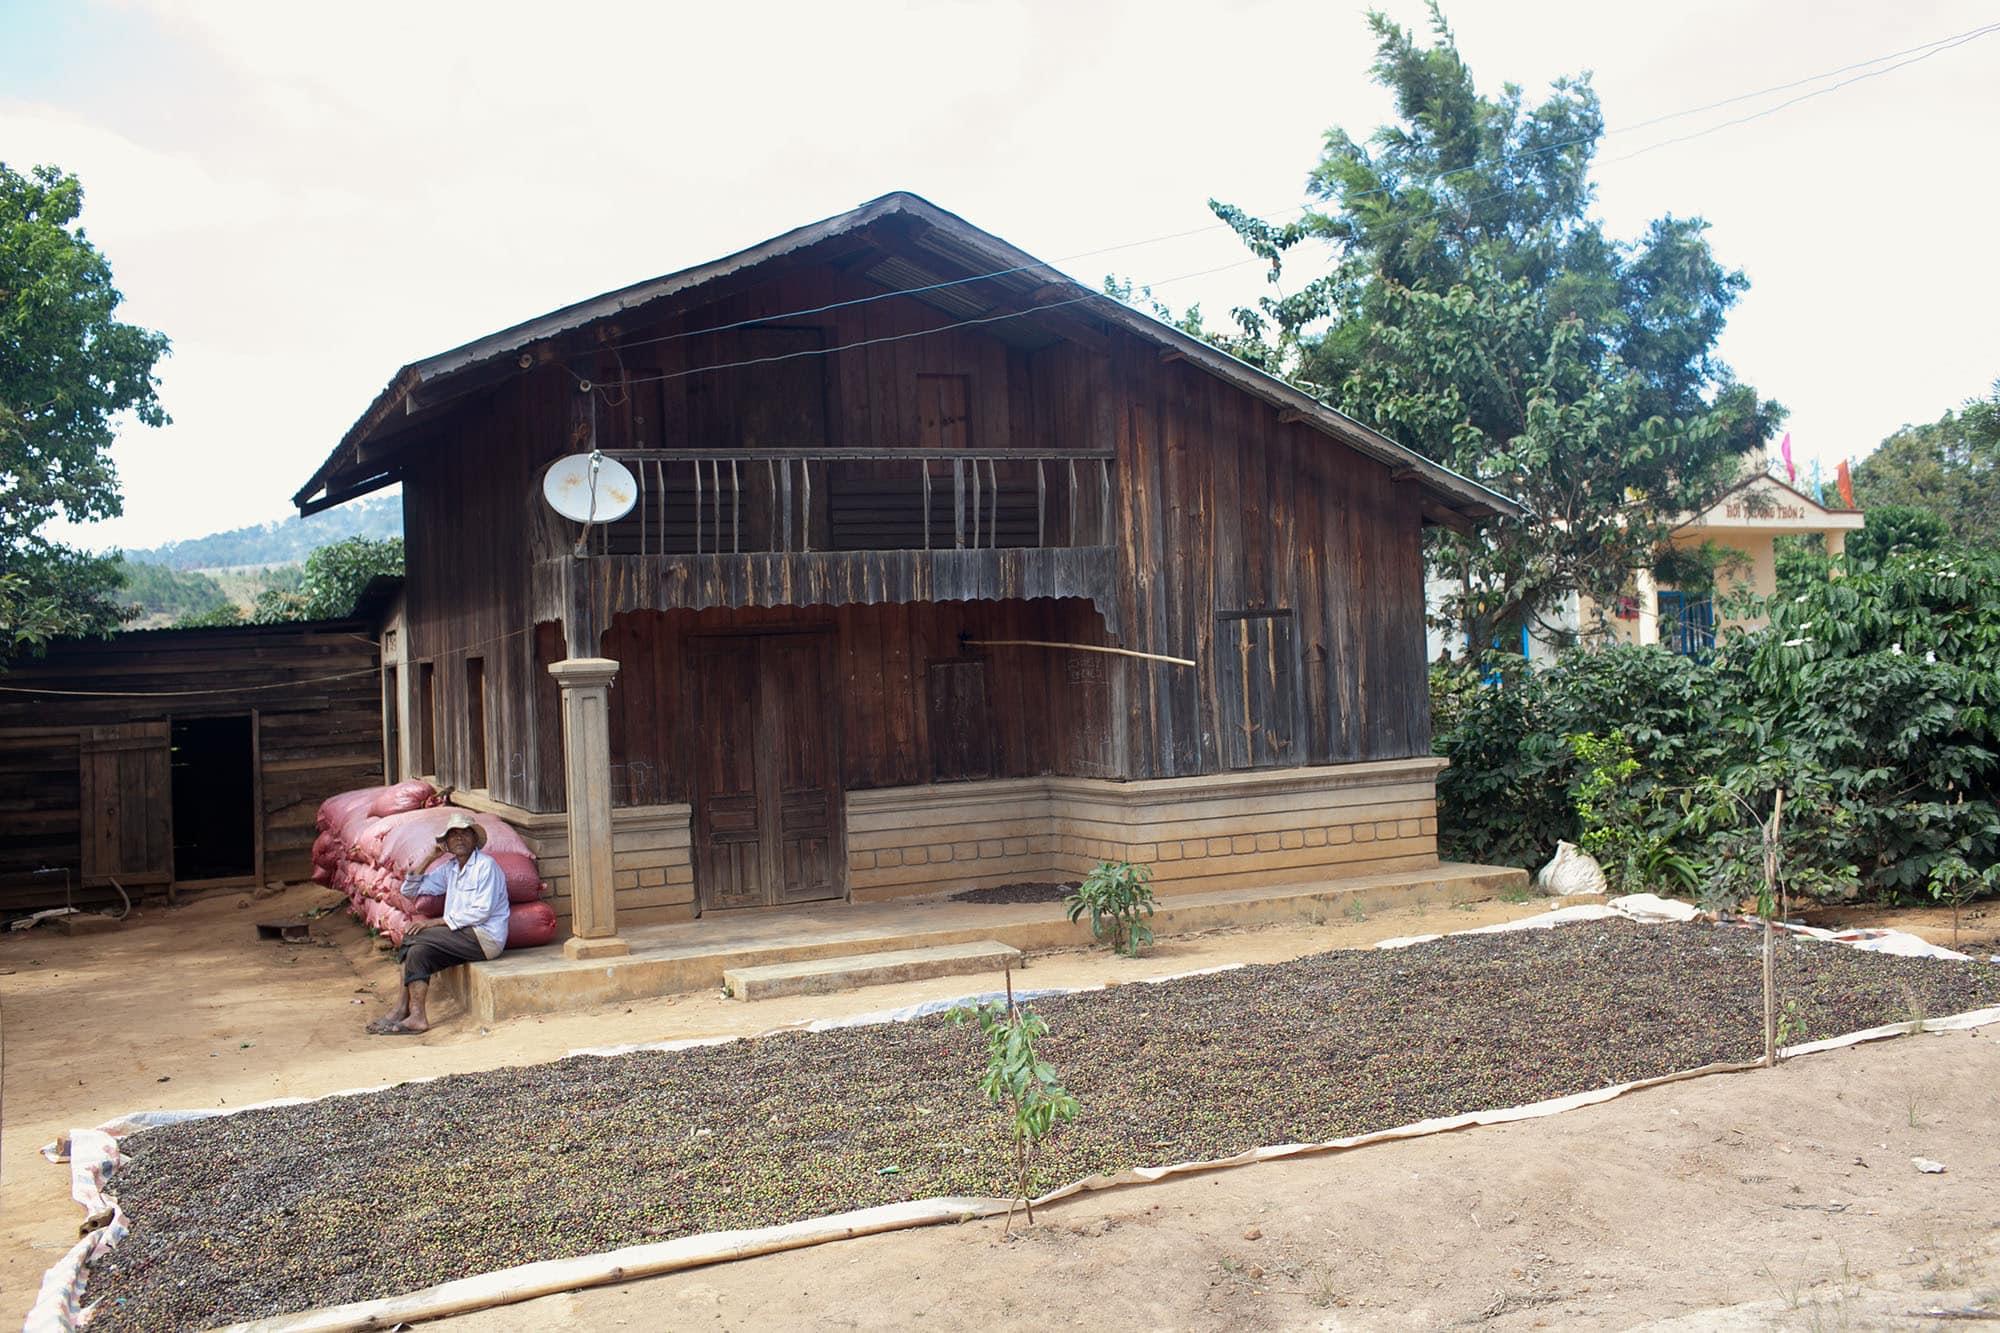 Minority village in Dalat, Vietnam - Dalat Countryside Tour in Vietnam